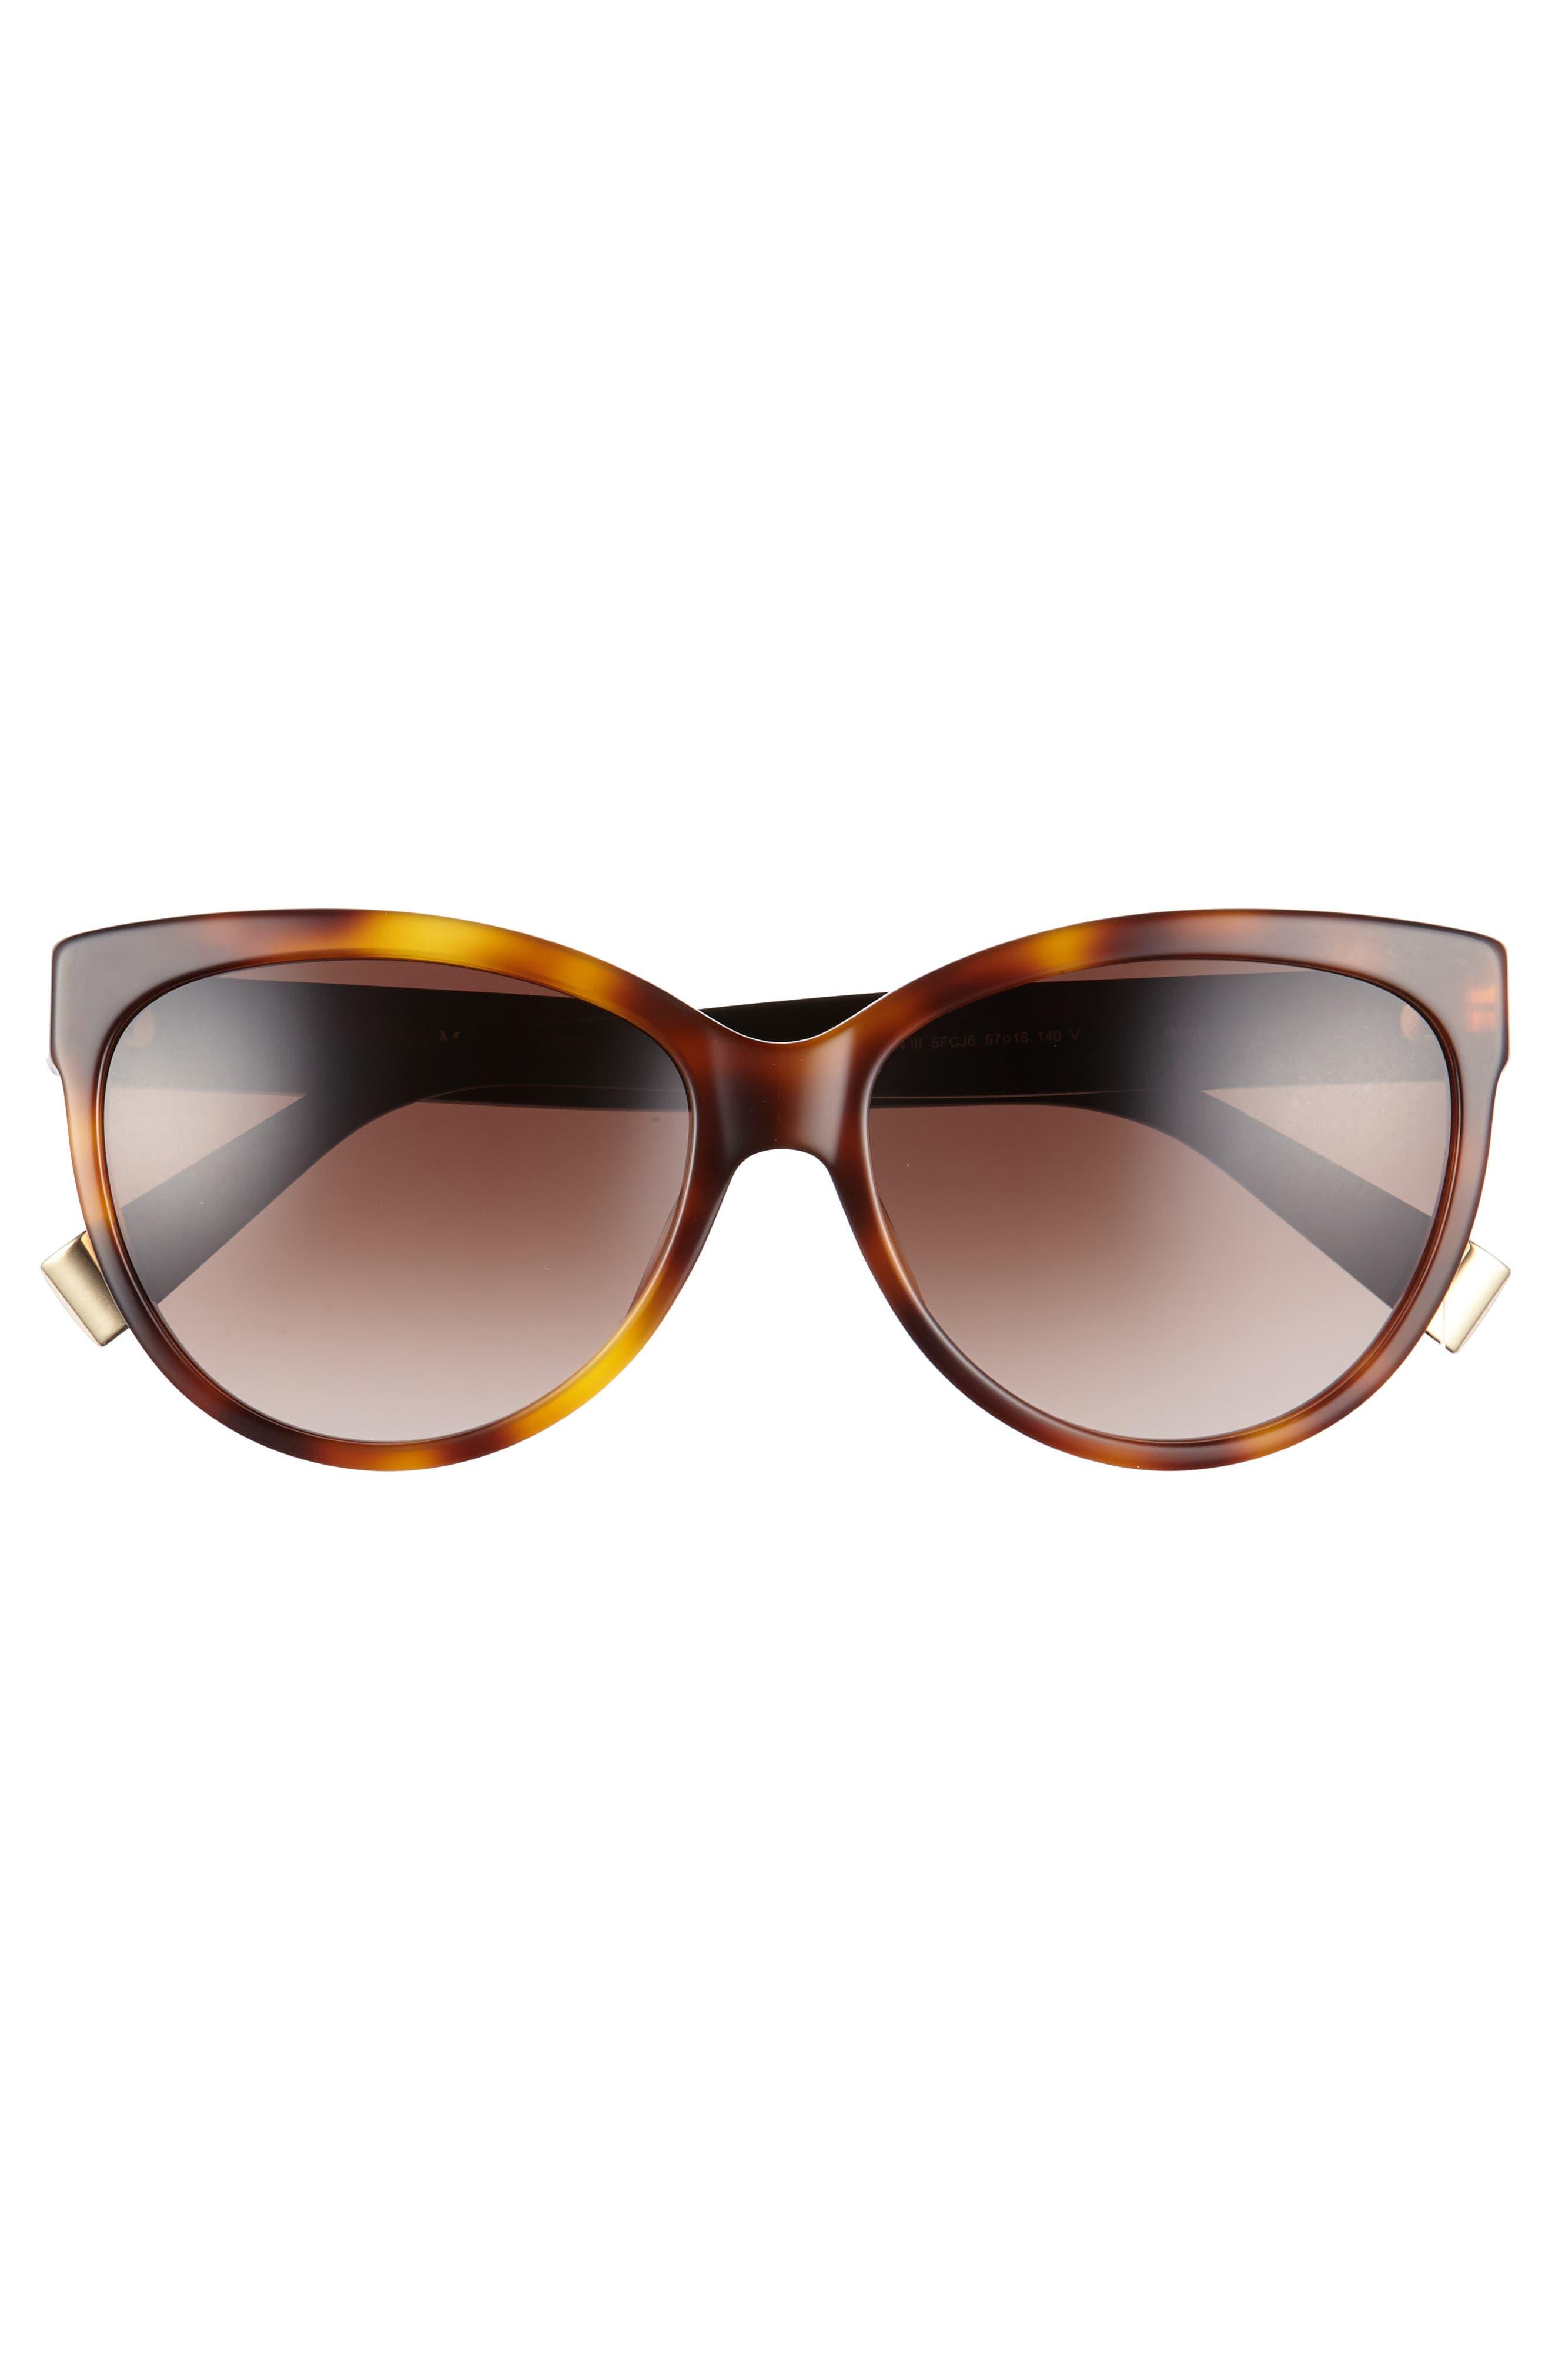 Moderii 57mm Gradient Cat Eye Sunglasses,                             Alternate thumbnail 6, color,